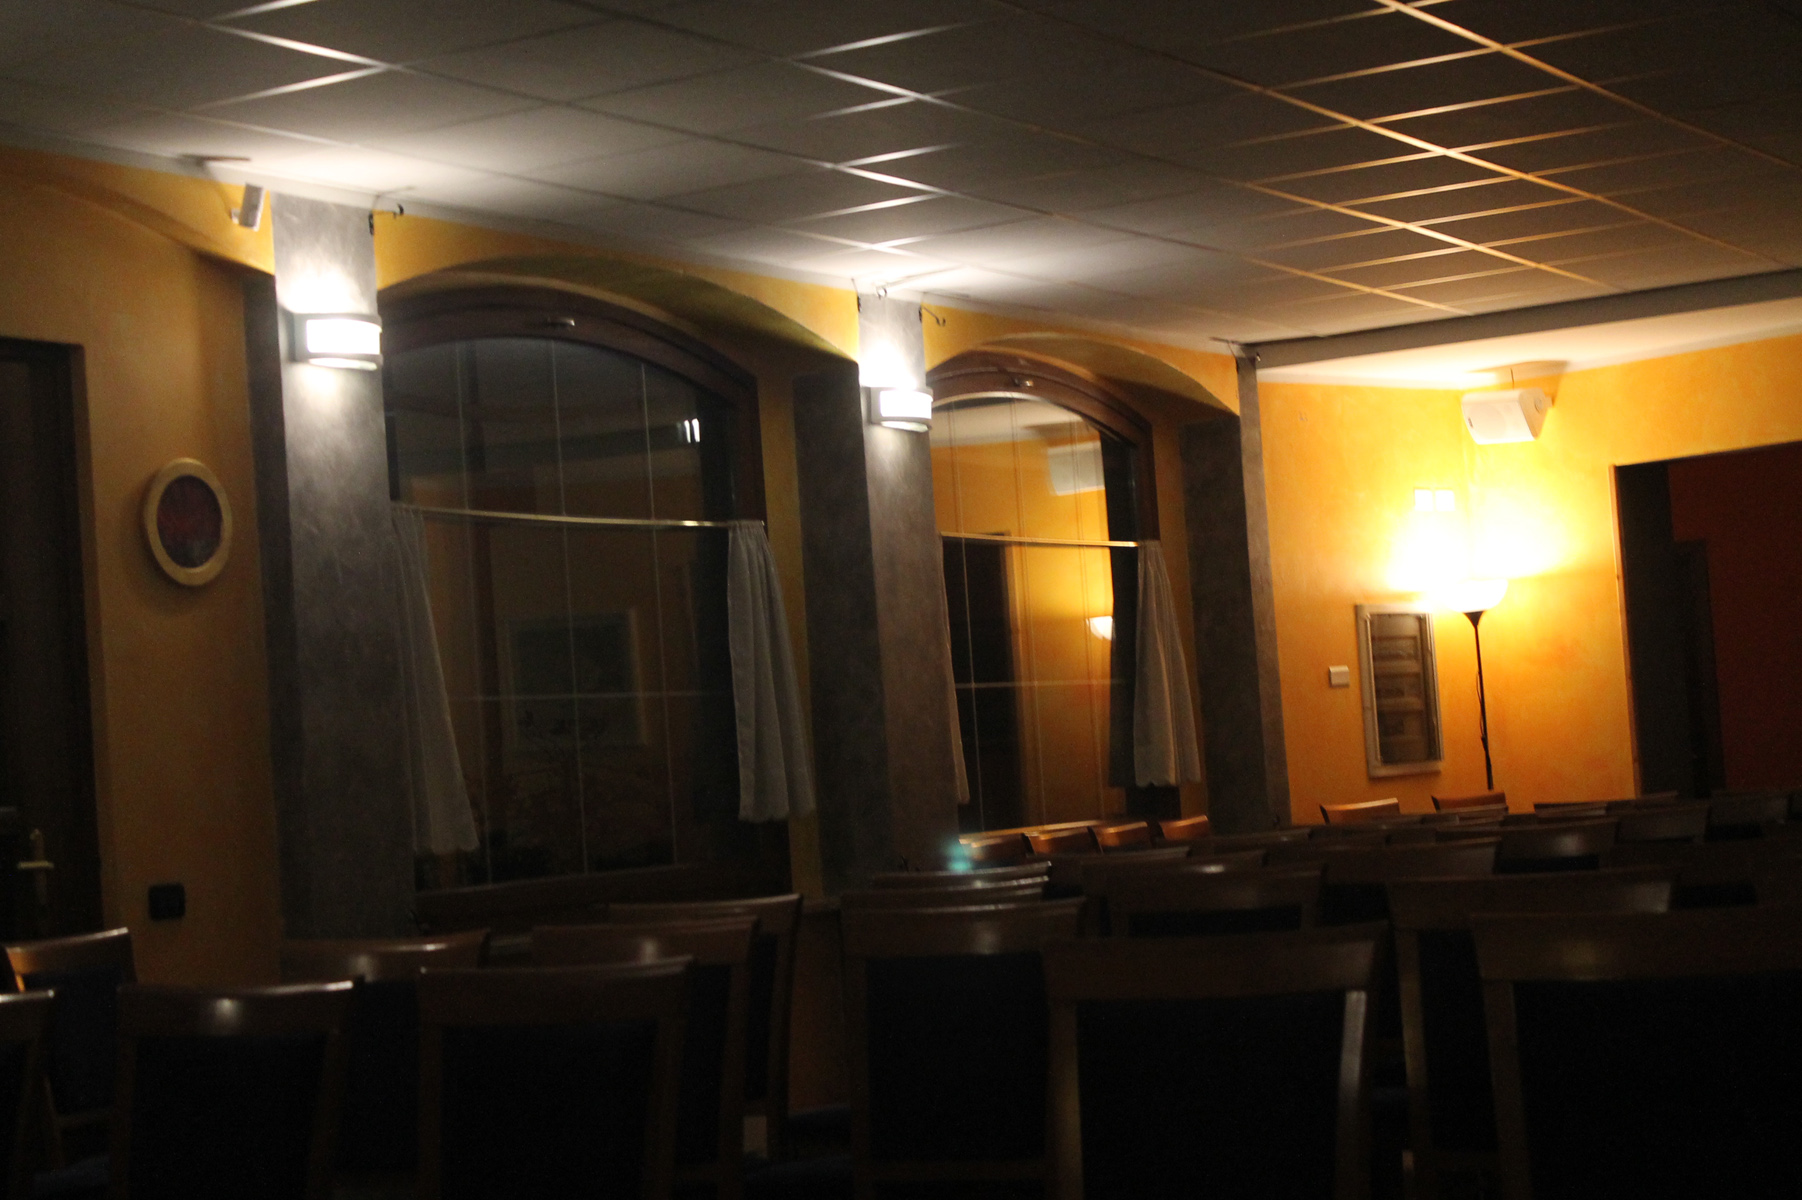 img 4161 - Gallery serata cabaret tosco emiliano